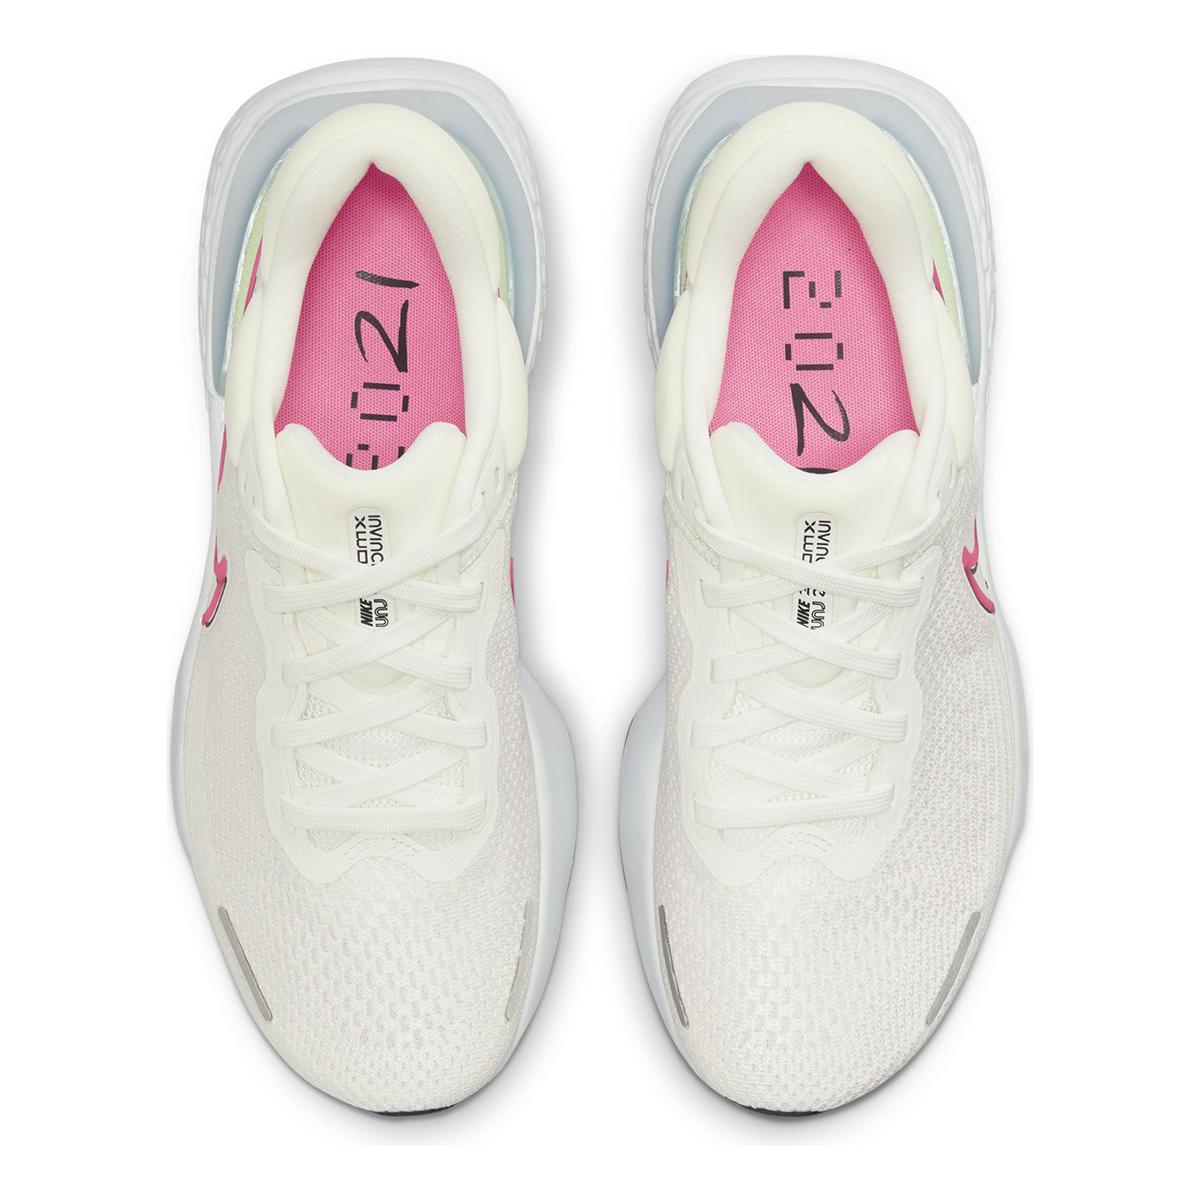 Men's Nike ZoomX Invincible Run Flyknit Running Shoe - Color: Rawdacious - Size: 6 - Width: Regular, Rawdacious, large, image 5